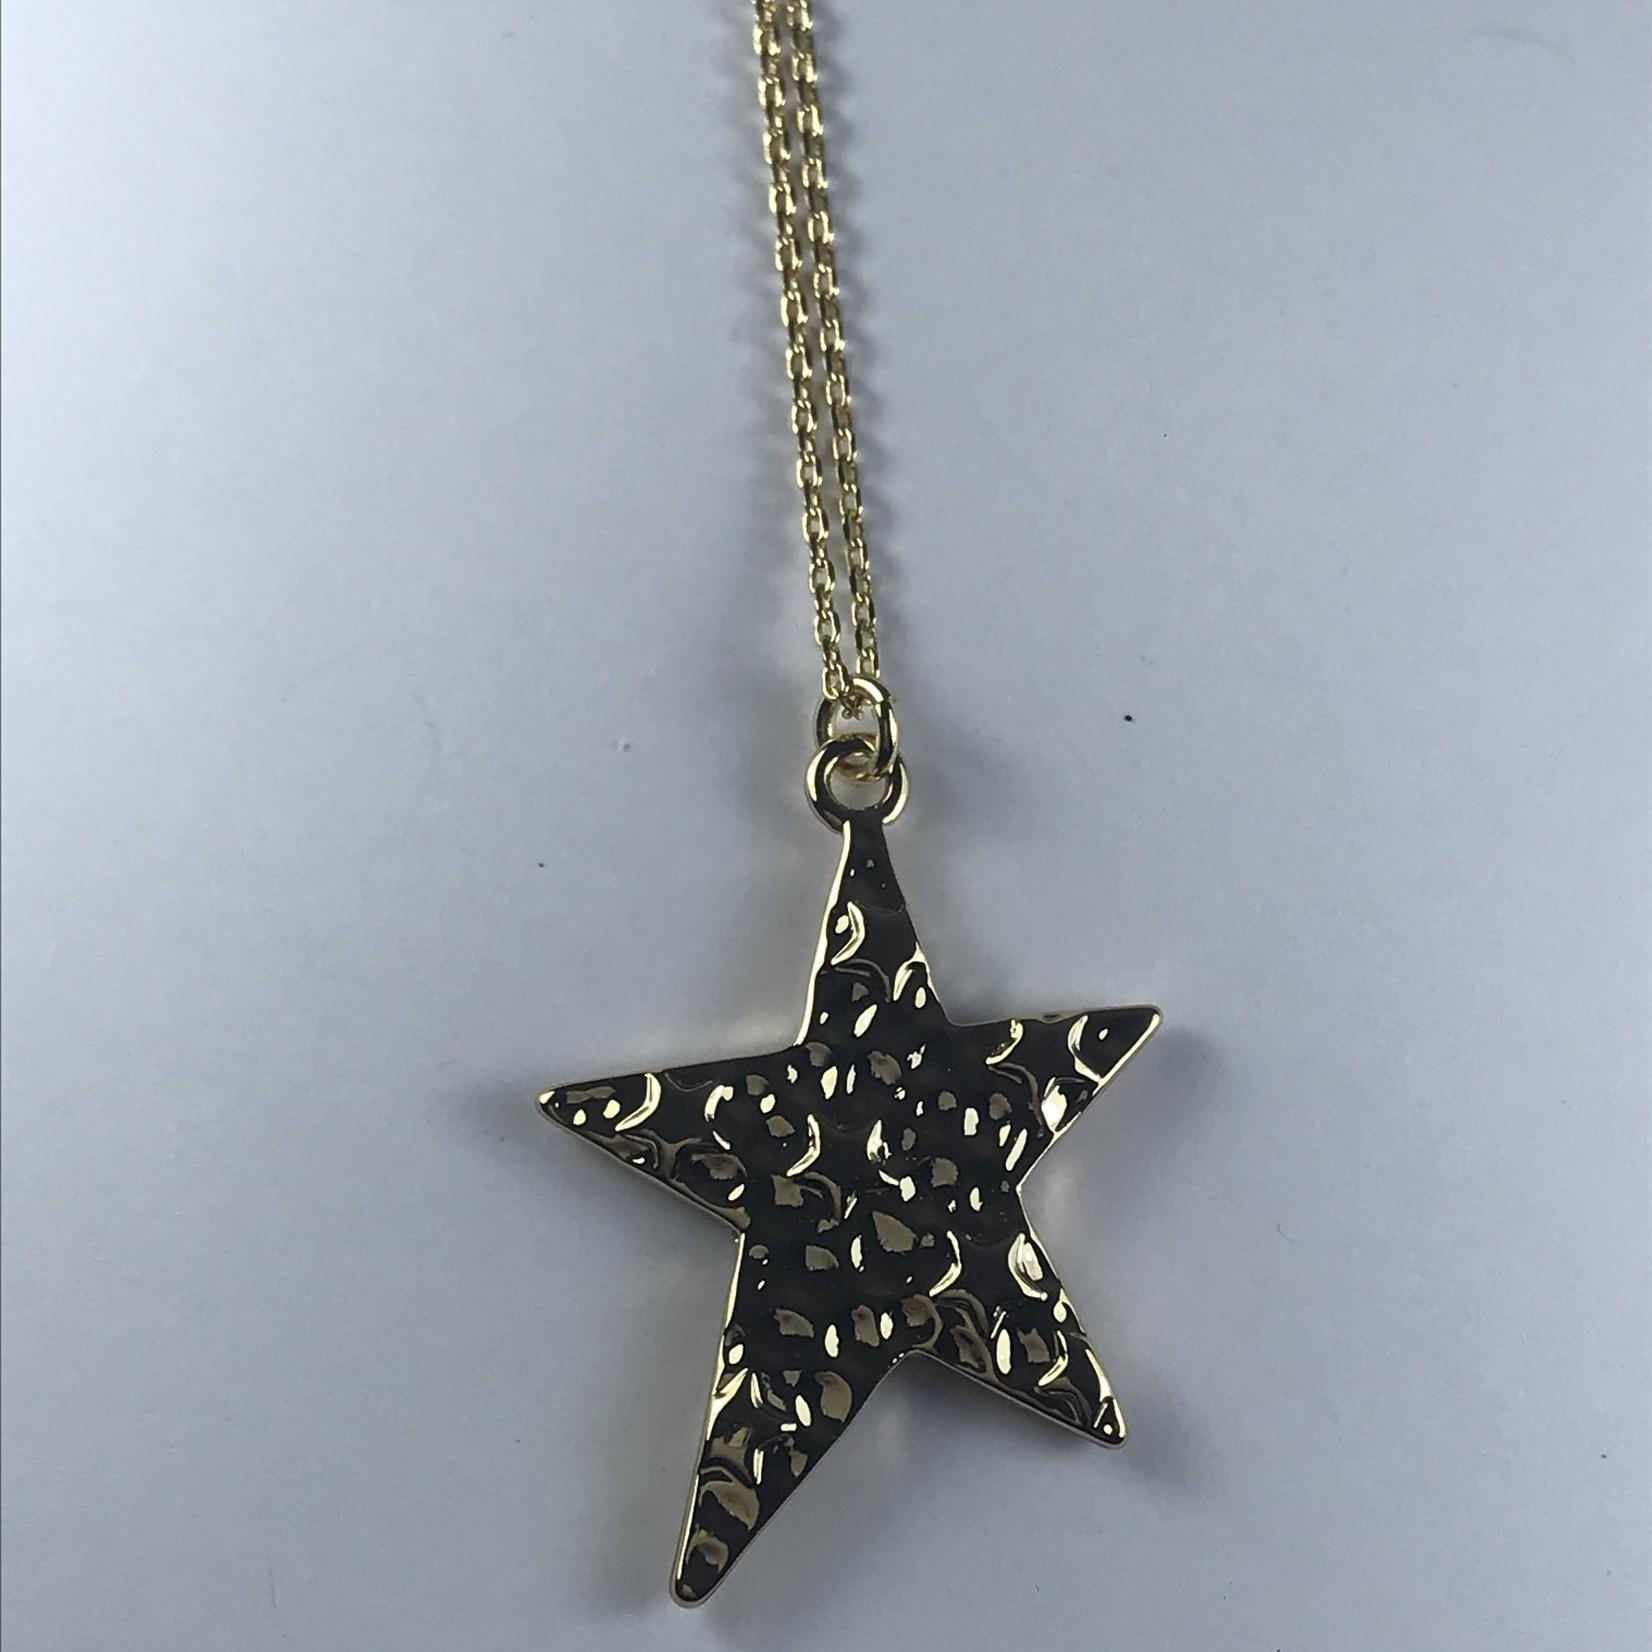 Biba Kettinjg kort goudkleurig met  hanger ster